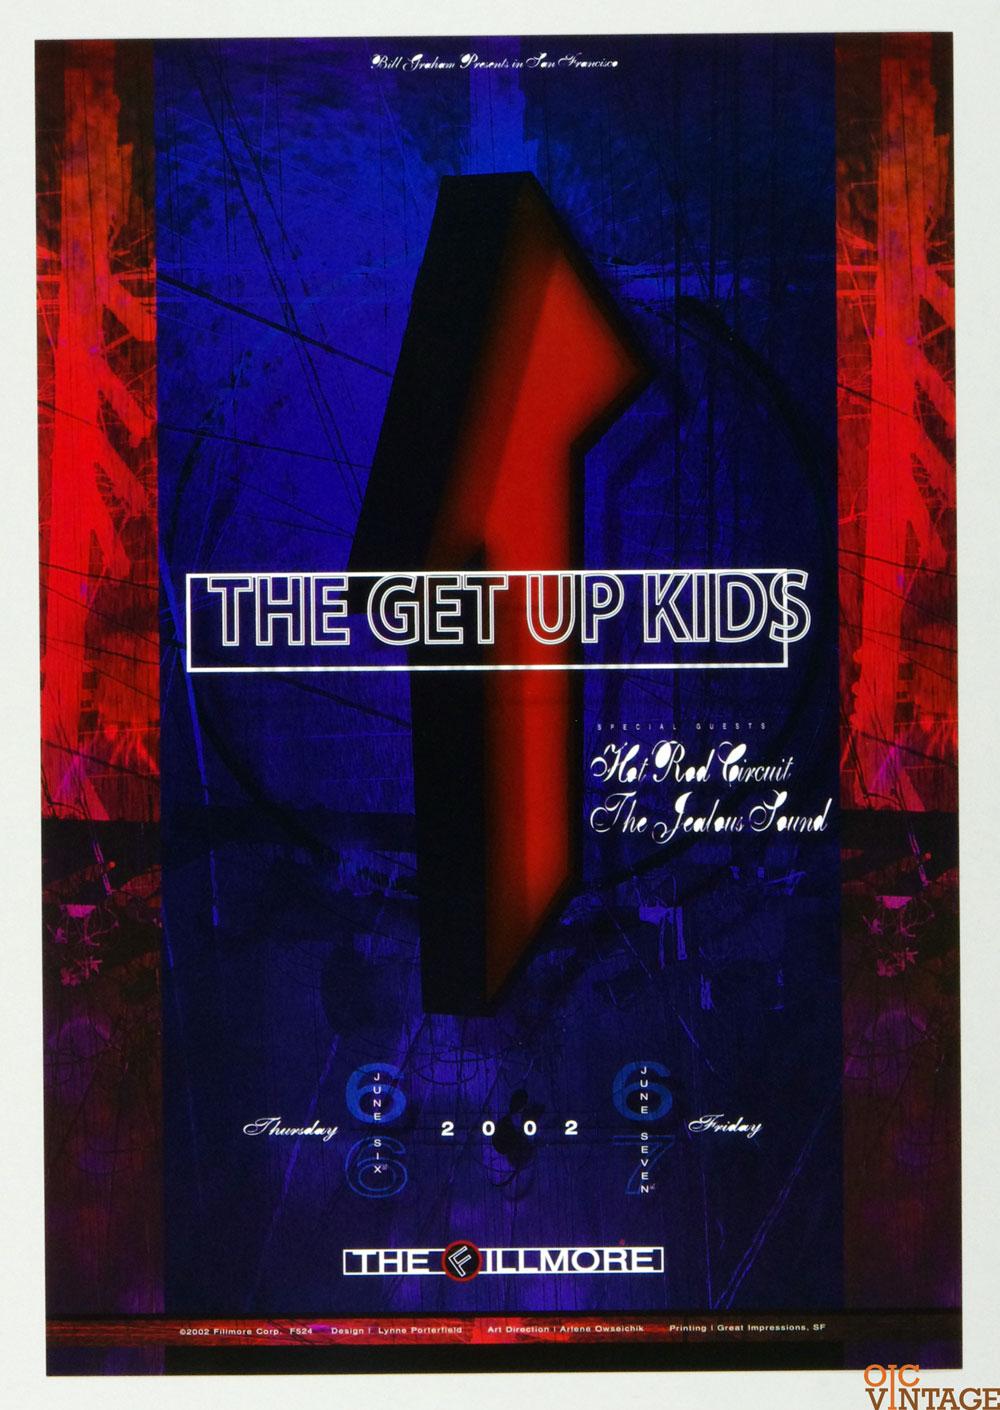 New Fillmore F524 Poster The Get Up Kids Hot Rod Circuit 2002 Jun 6